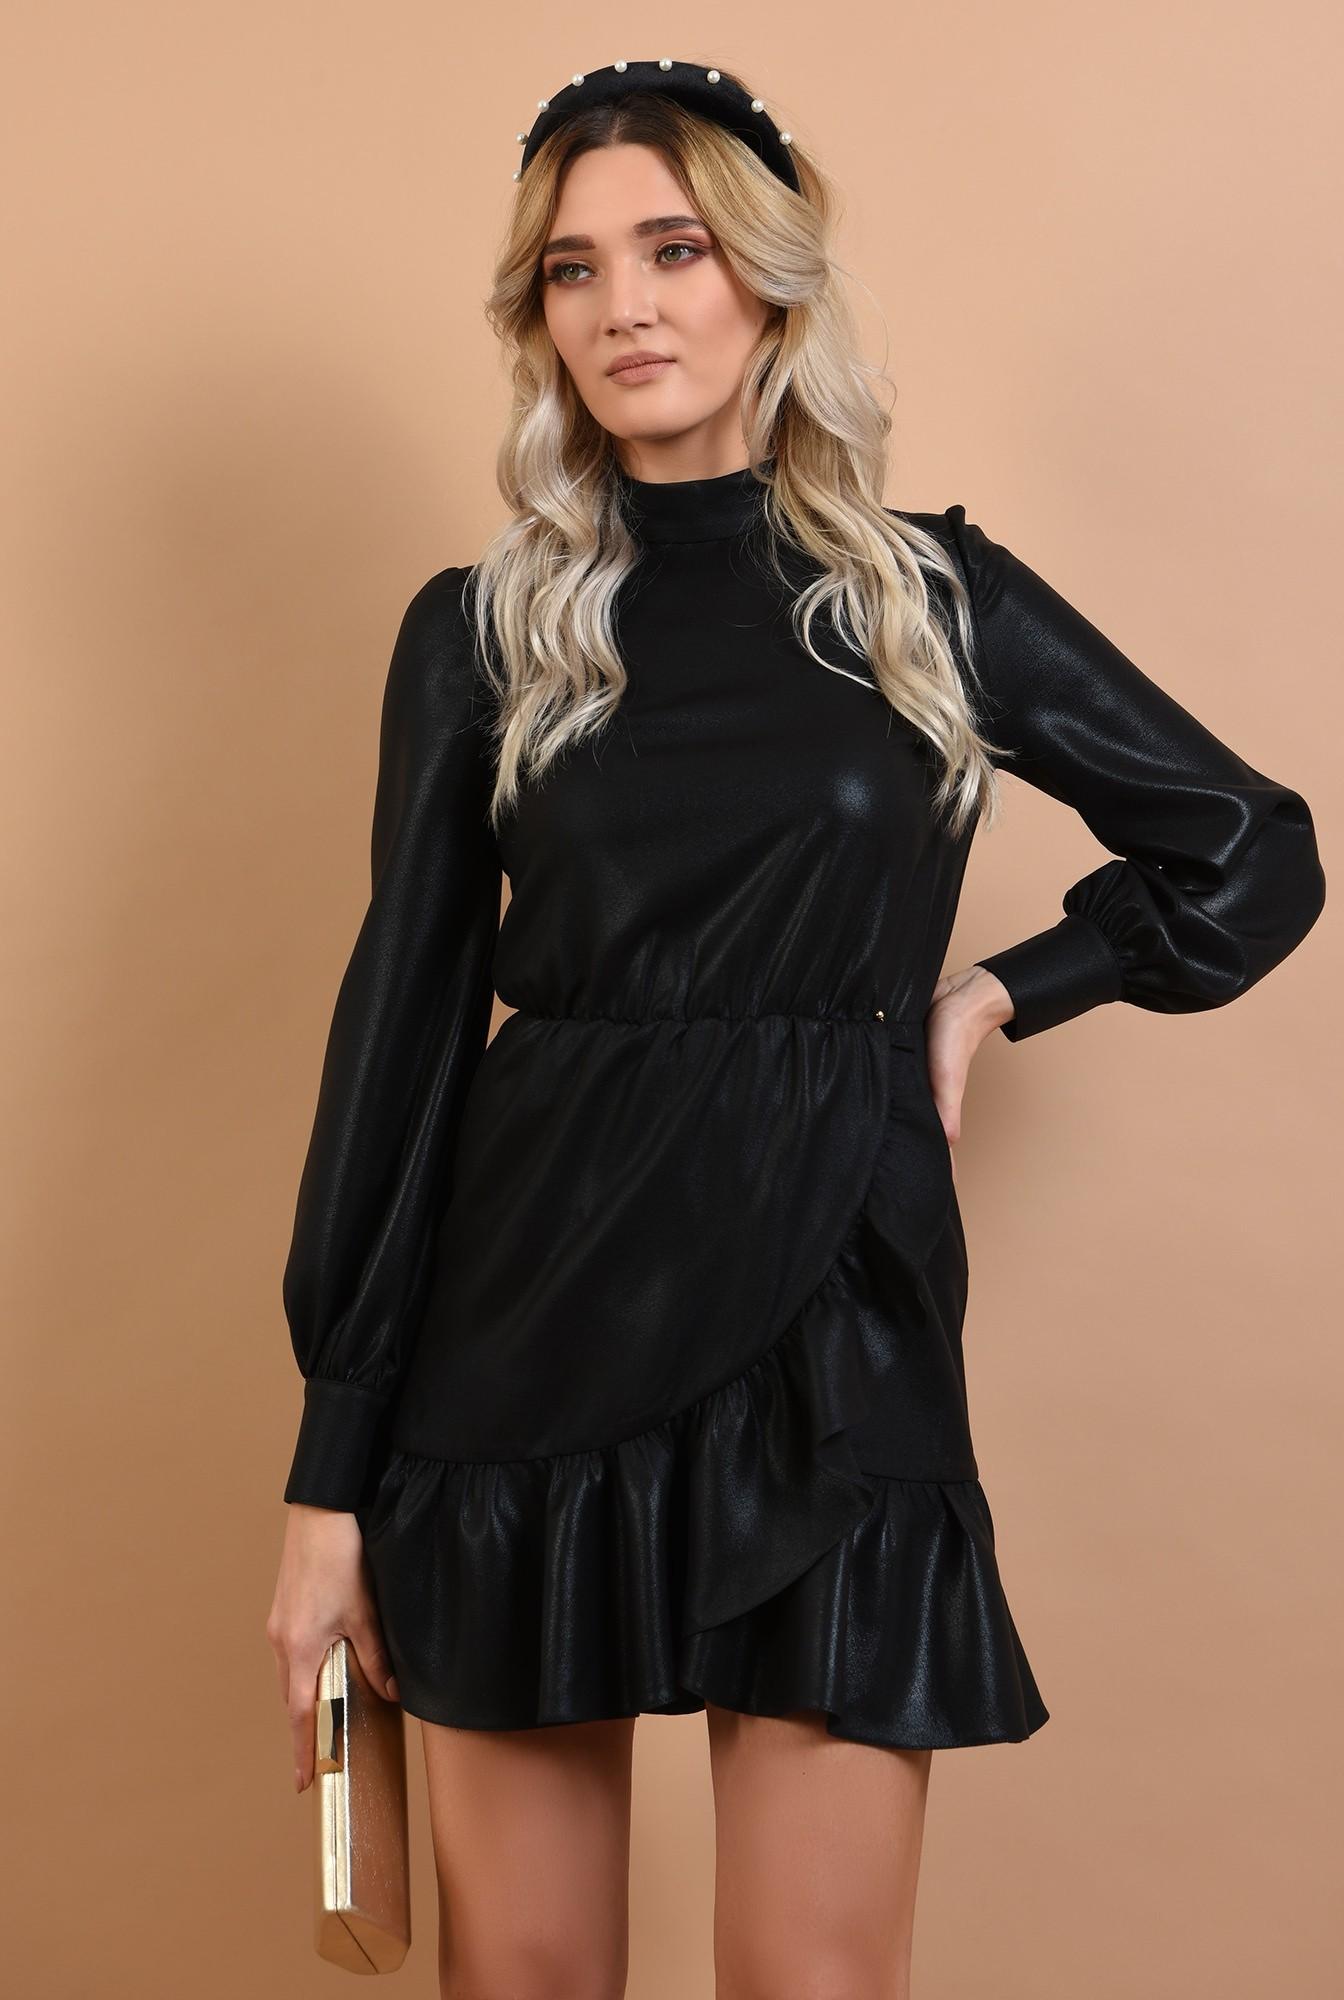 0 - 360 - rochie neagra, de ocazie, croi petrecut, nasturi la spate, Poema